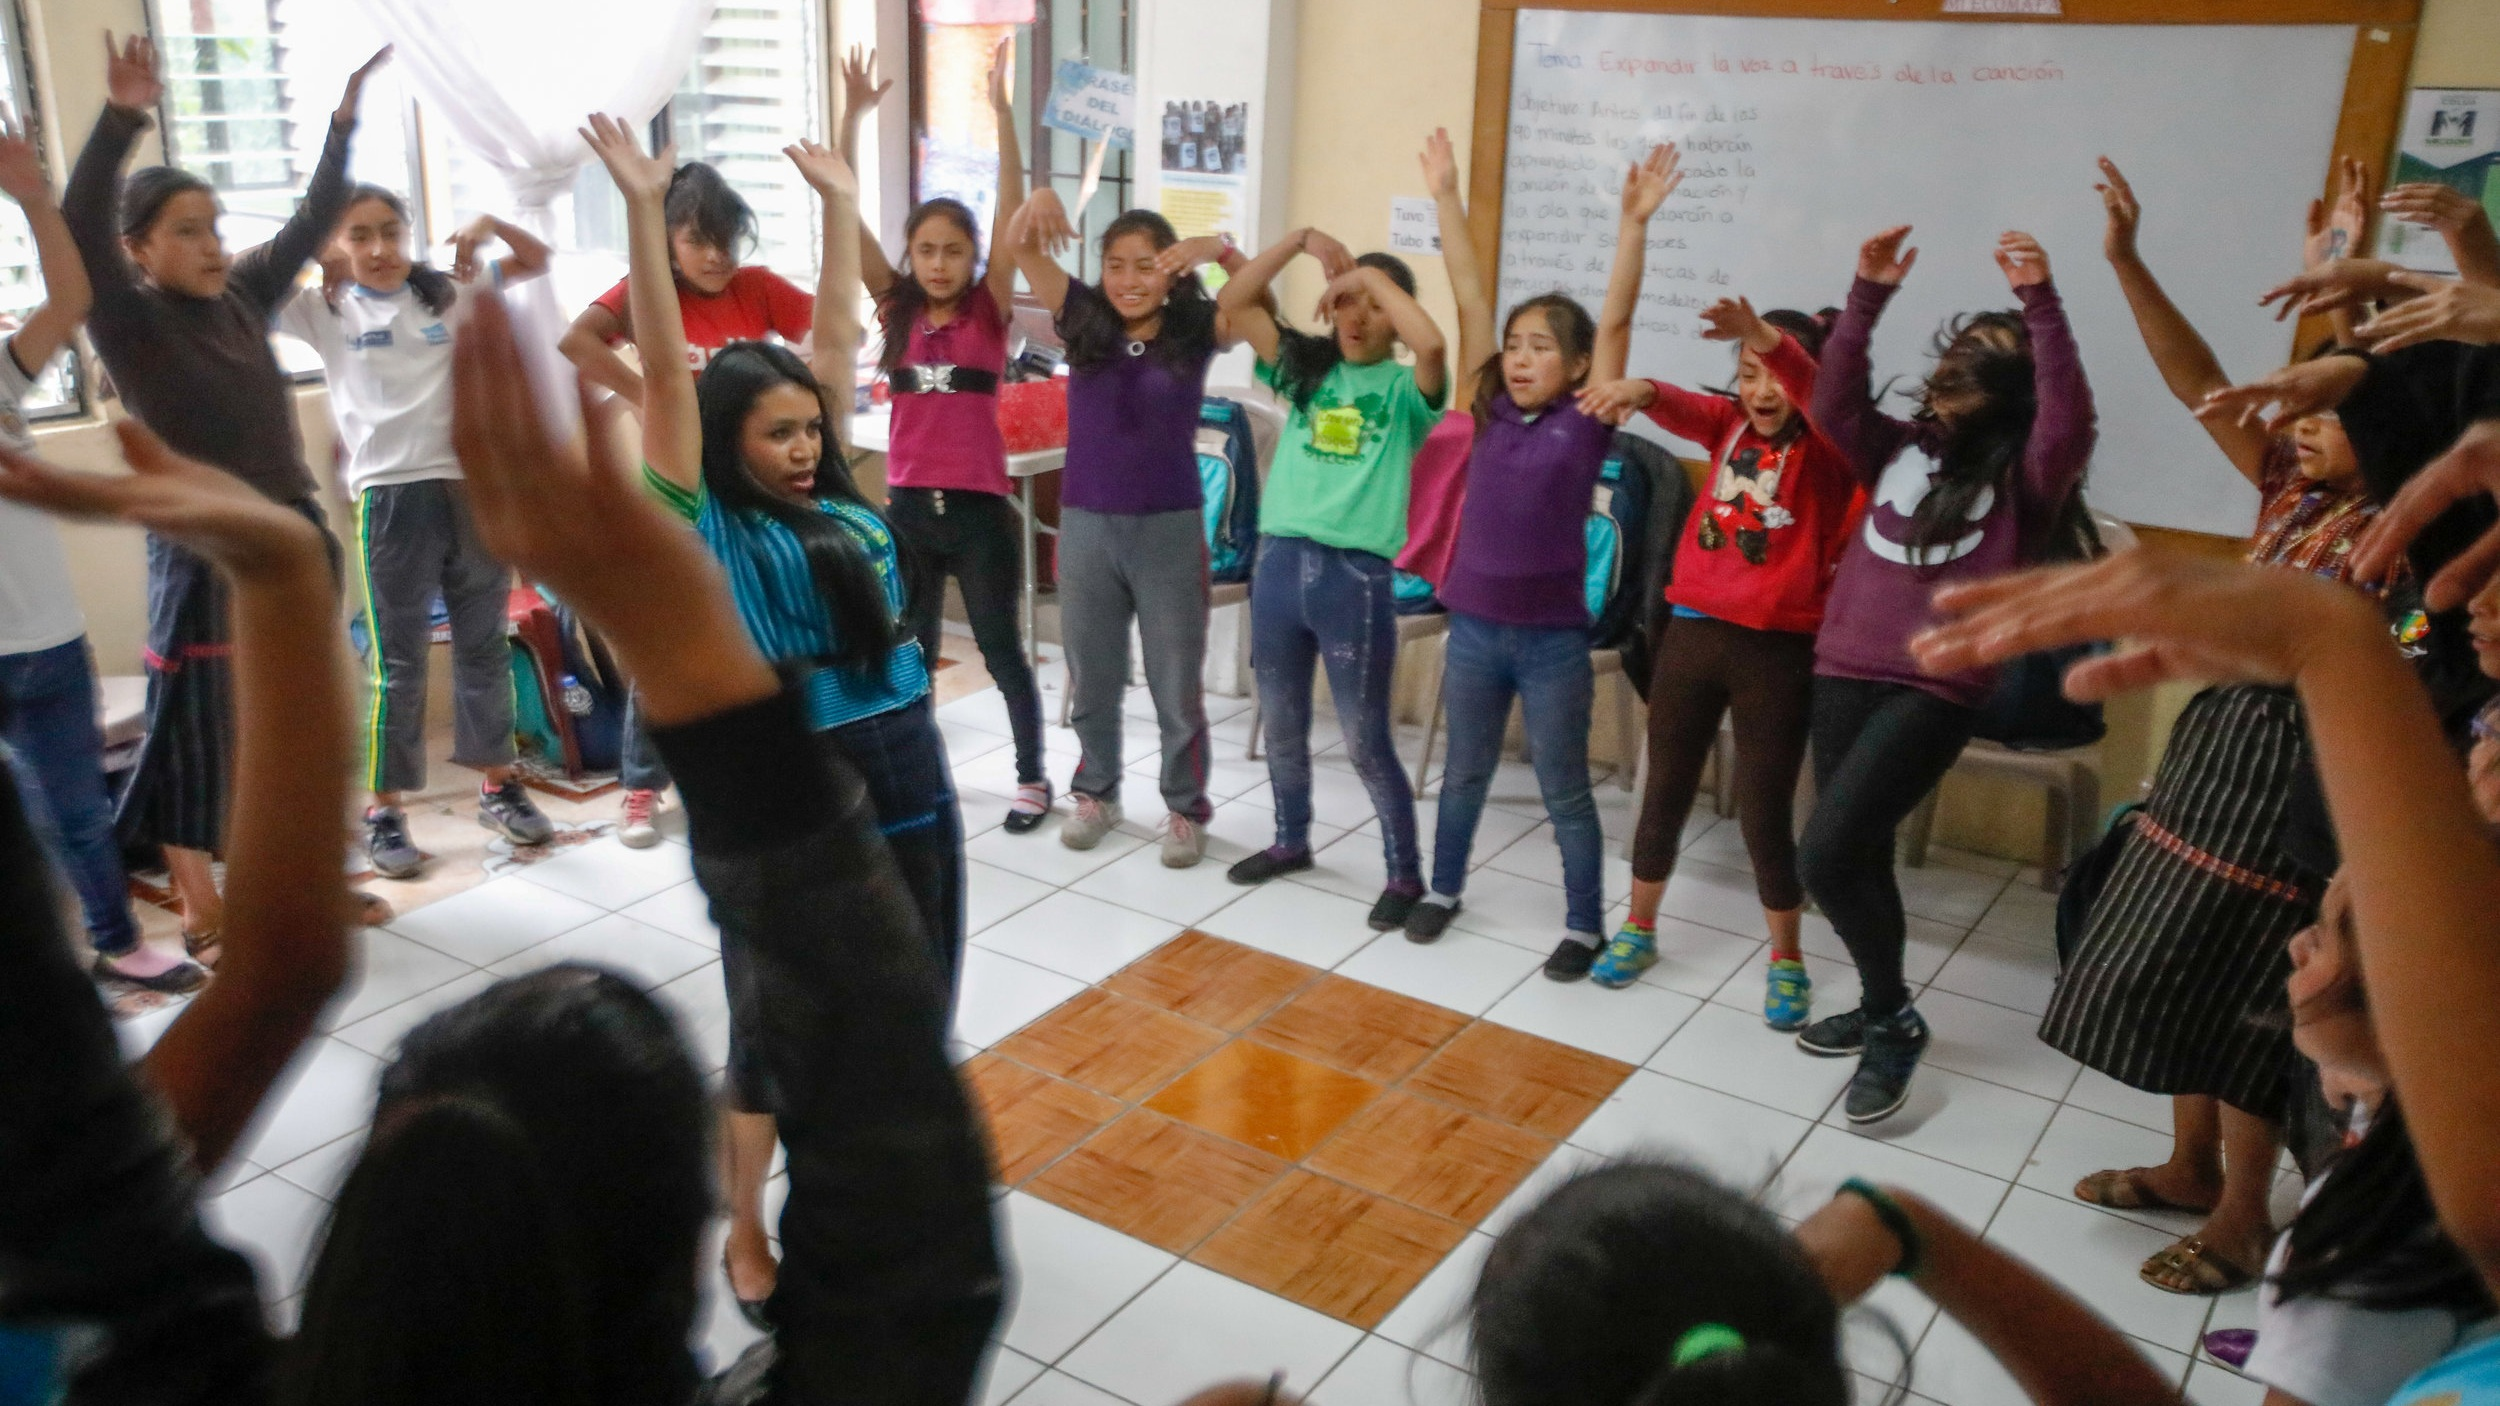 Irma's mentorship class at the impact school